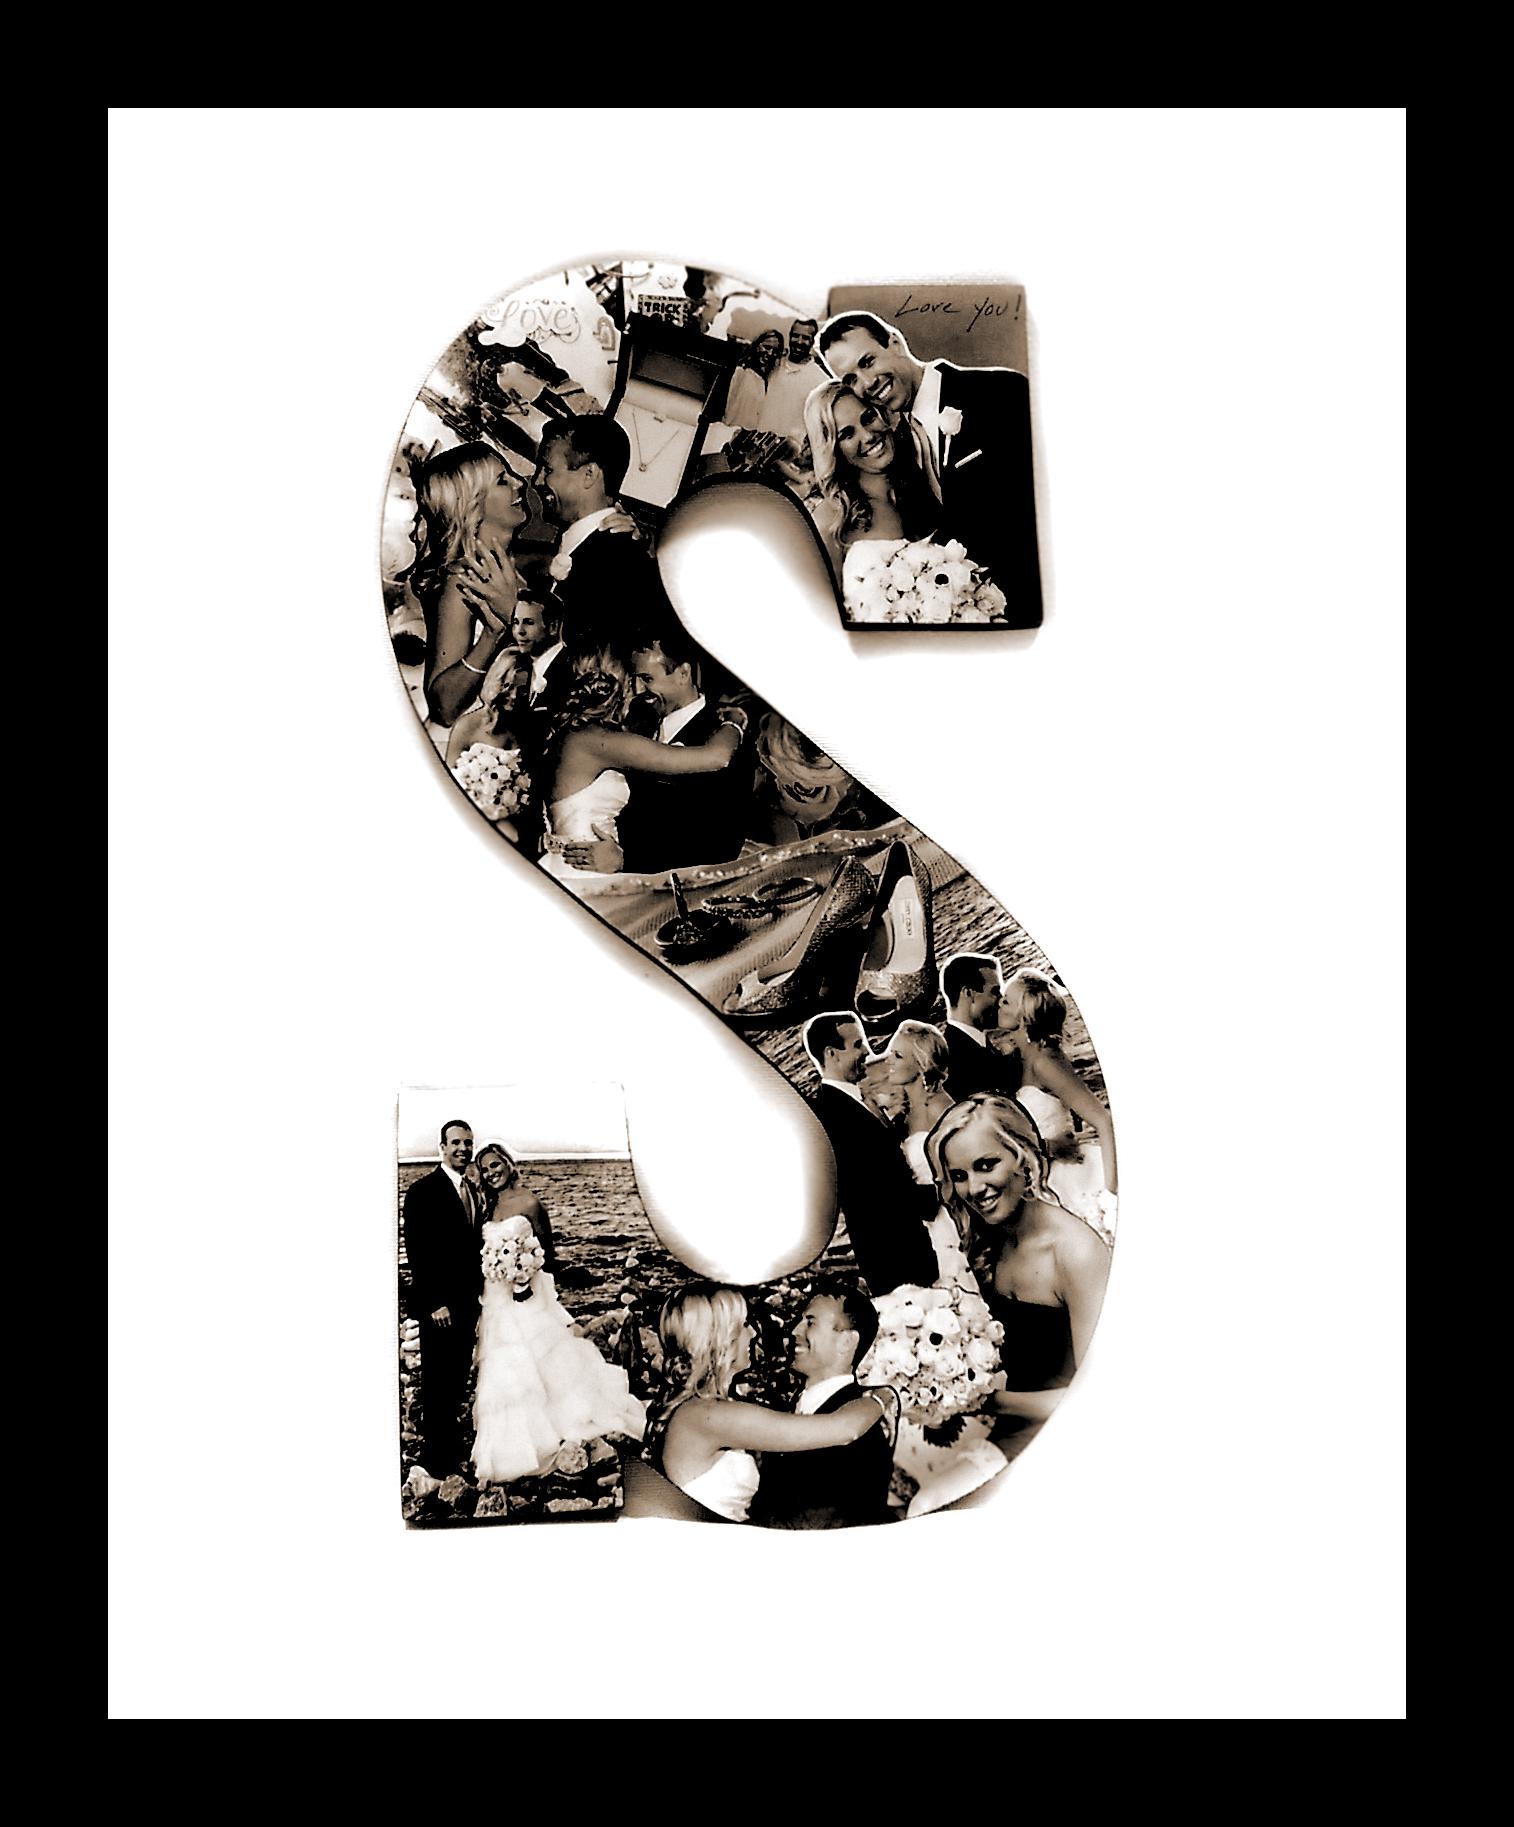 S ok Sherman 12-14 (3)_edited-2.jpg